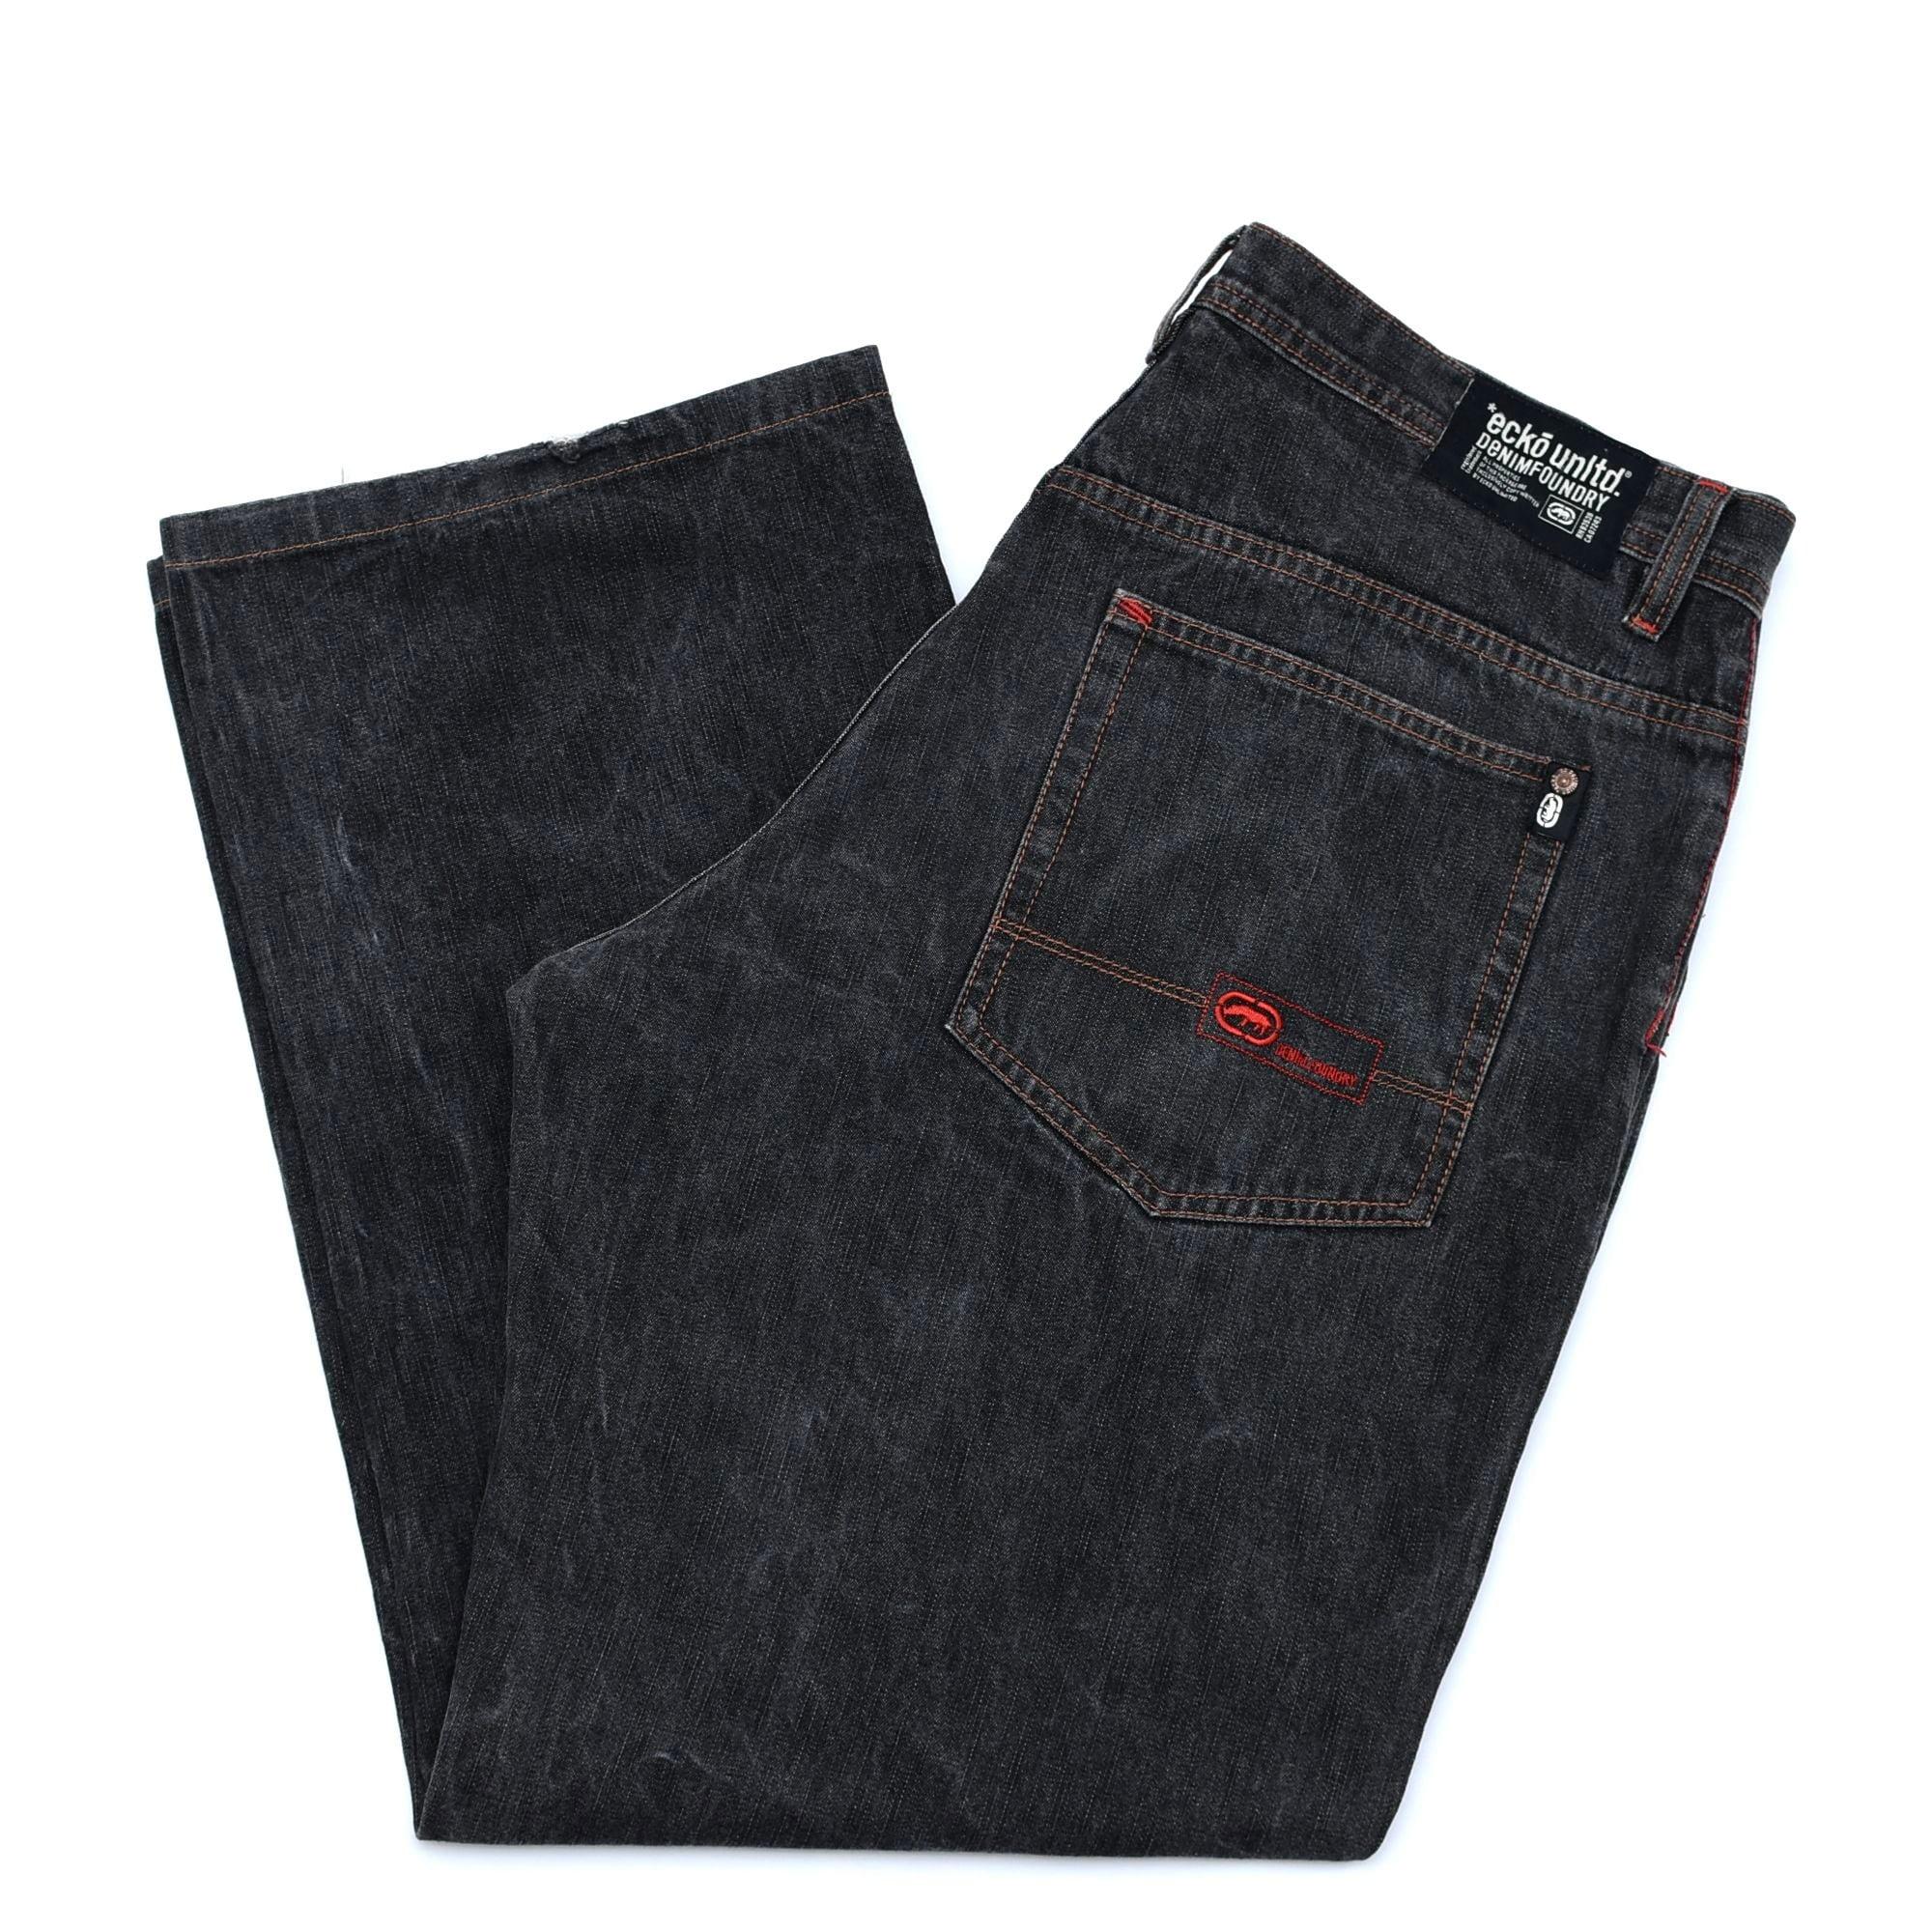 Ecko unltd black denim baggy pants